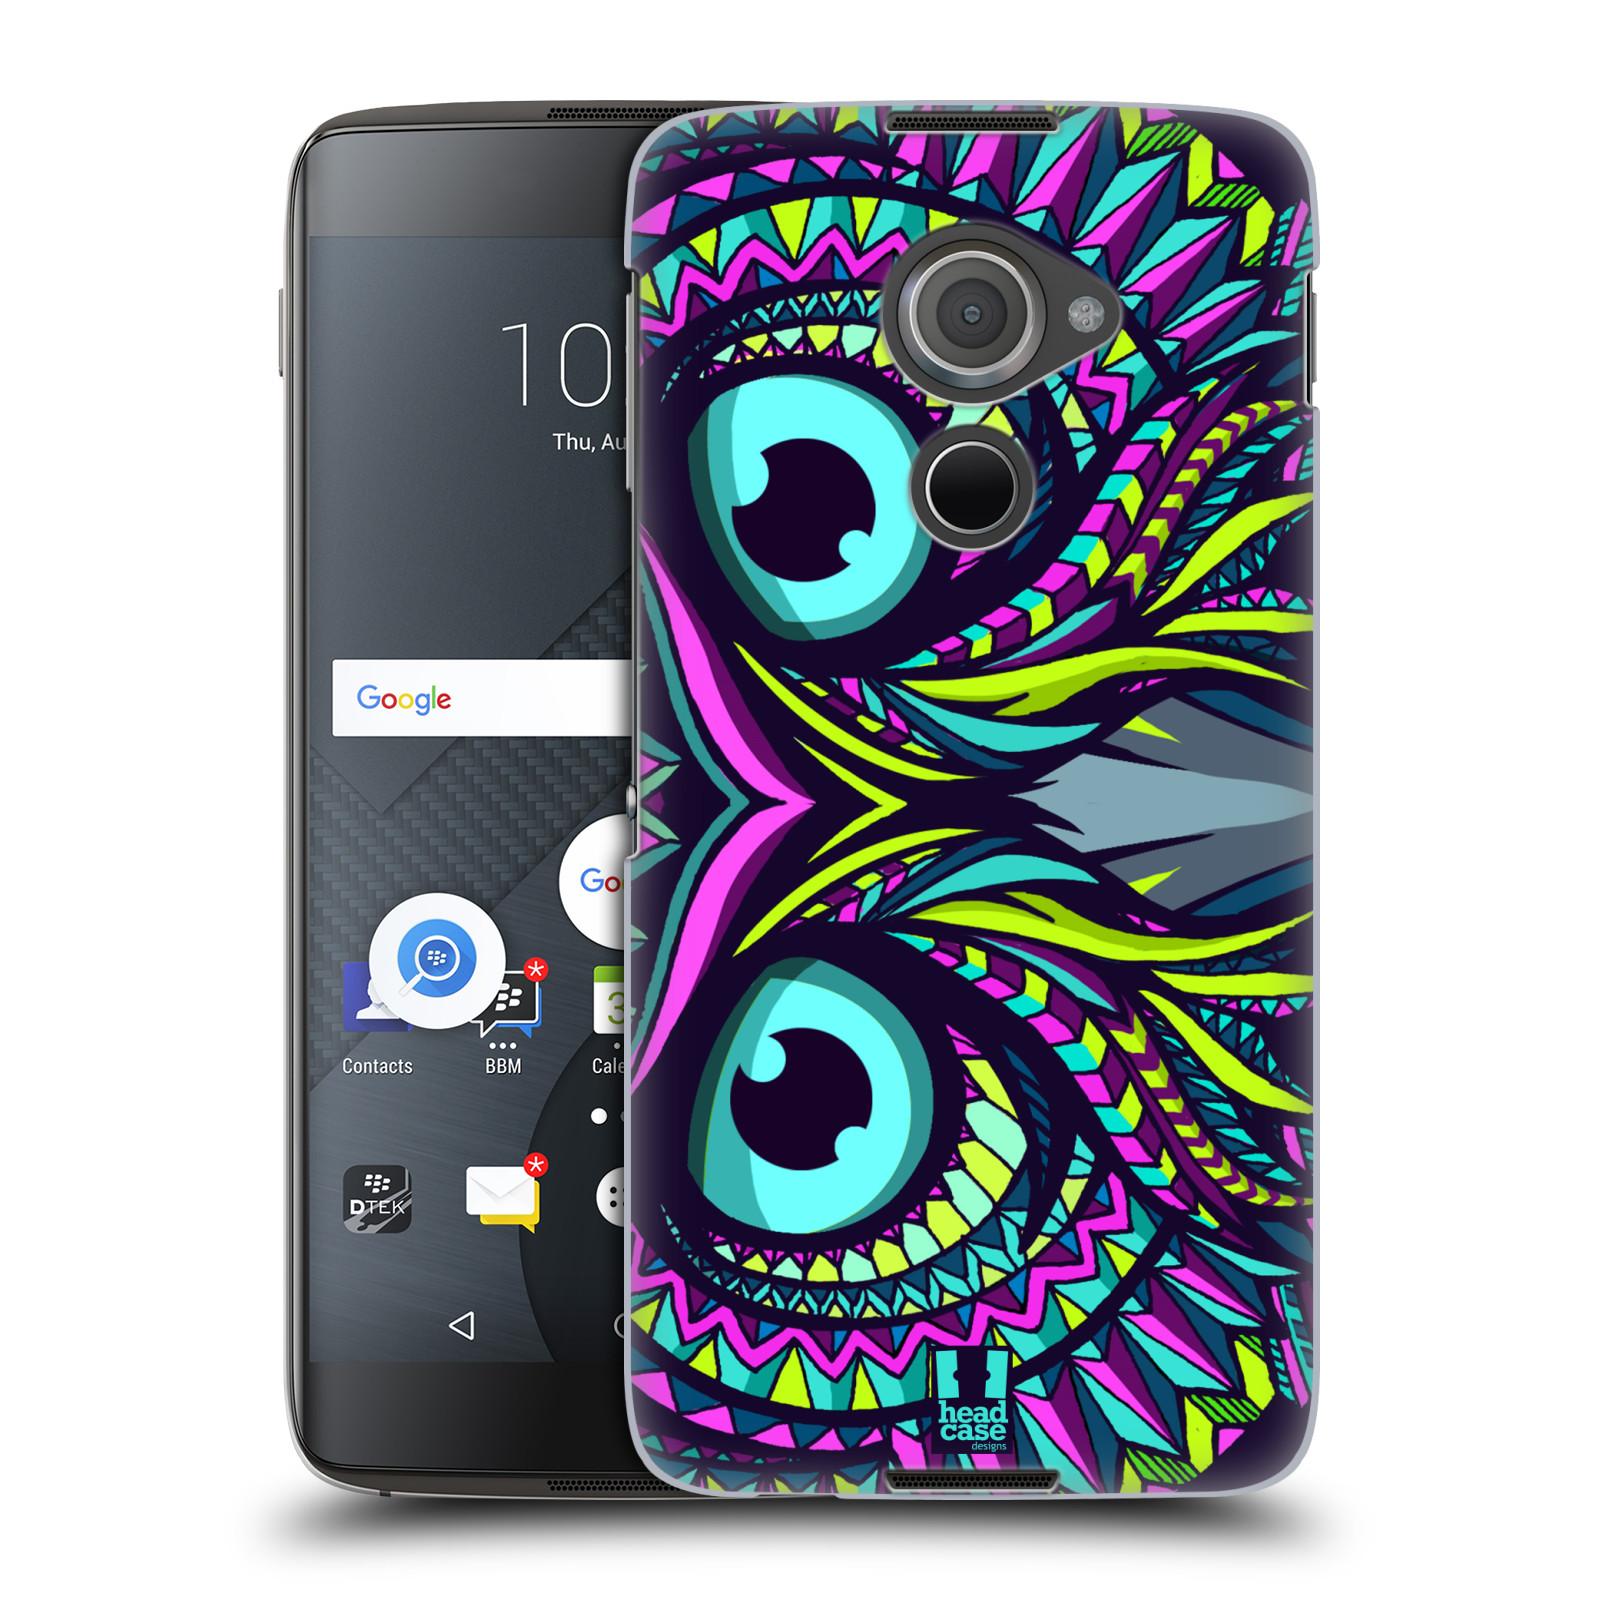 Plastové pouzdro na mobil Blackberry DTEK60 (Argon) - Head Case AZTEC SOVA